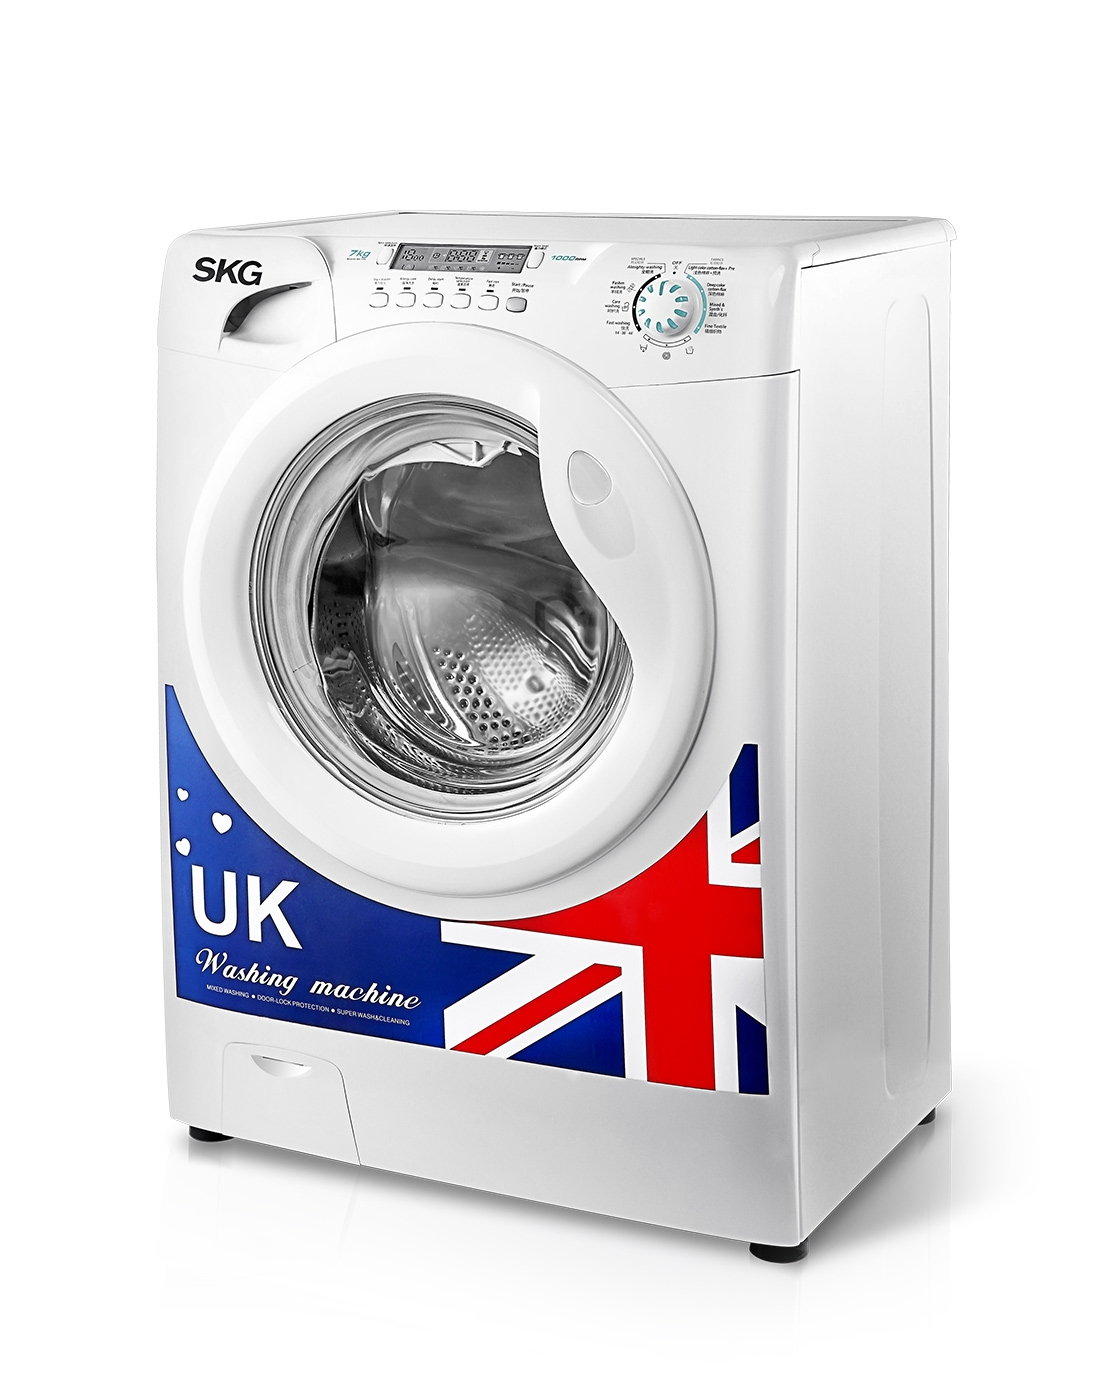 skg电器7公斤全自动滚筒洗衣机